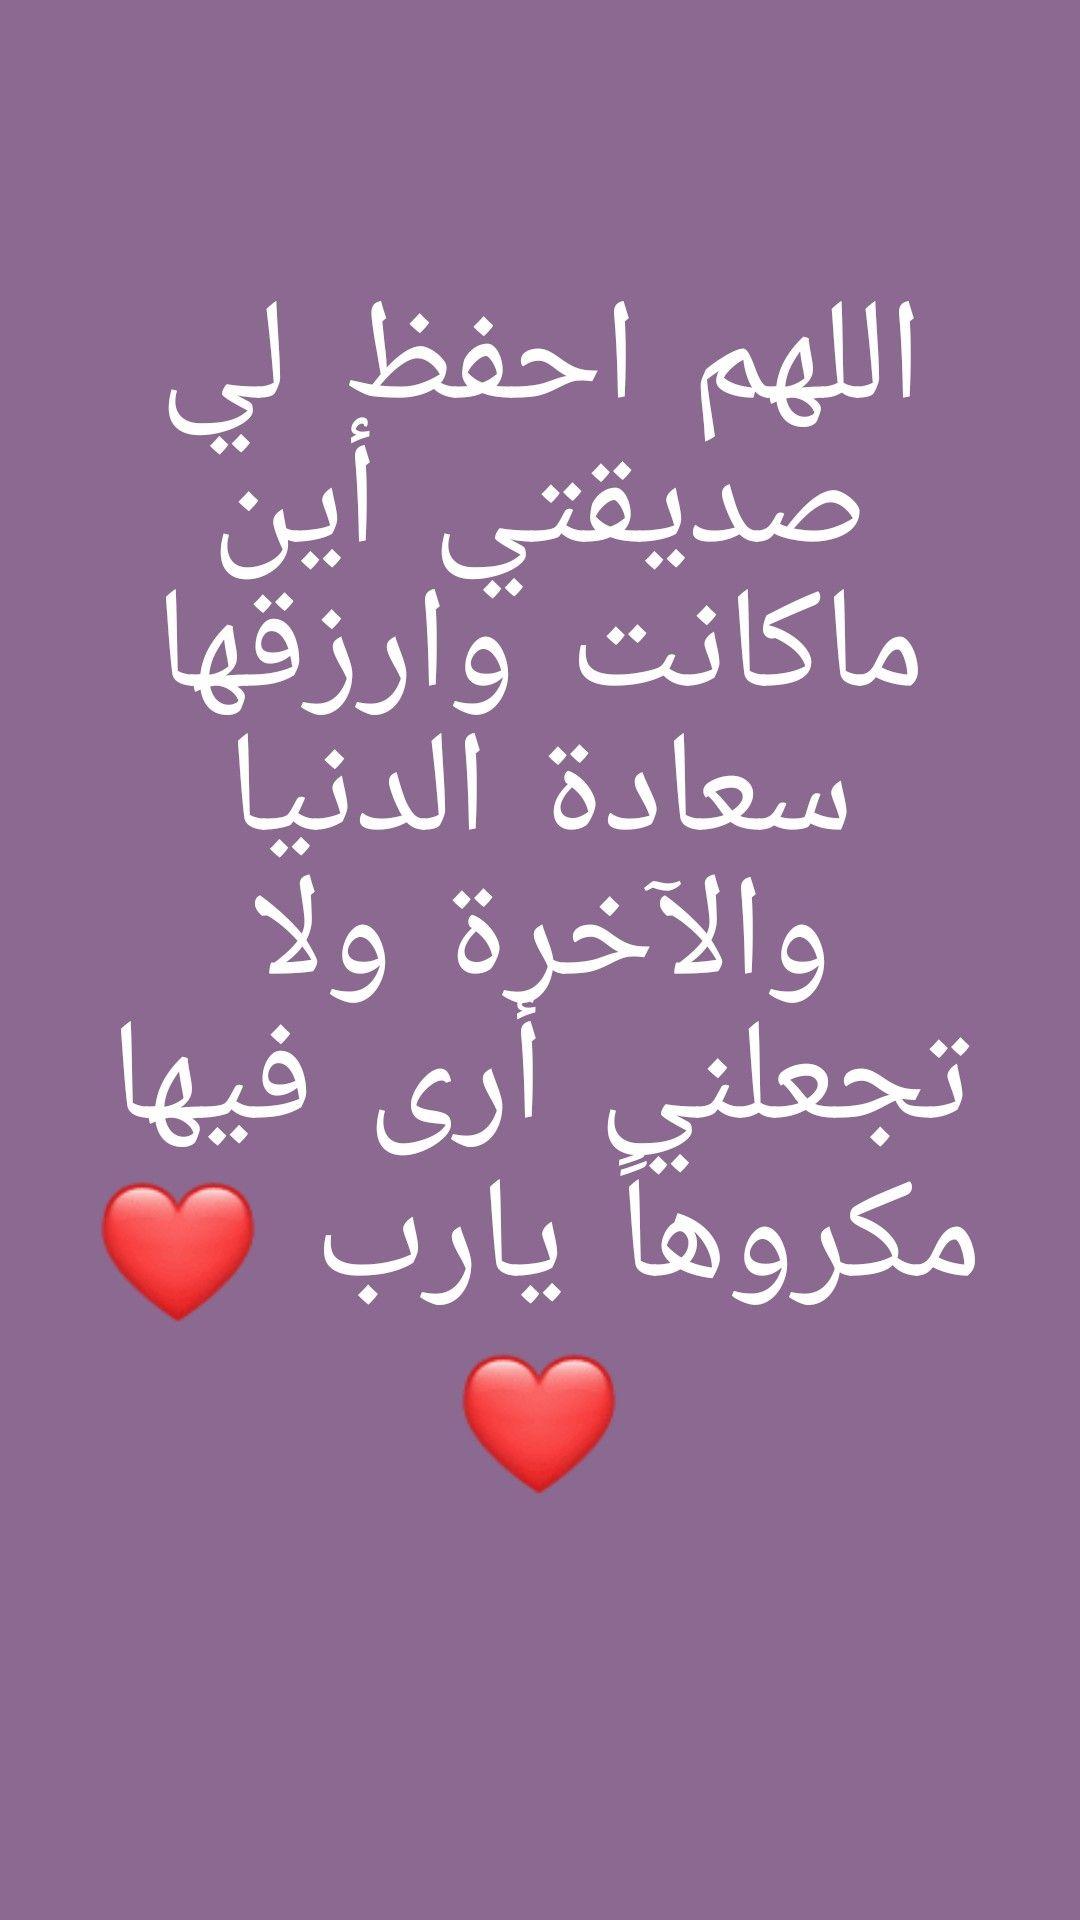 Pin By Sondos On كلام عن الأصدقاء Arabic Quotes Quotes Art